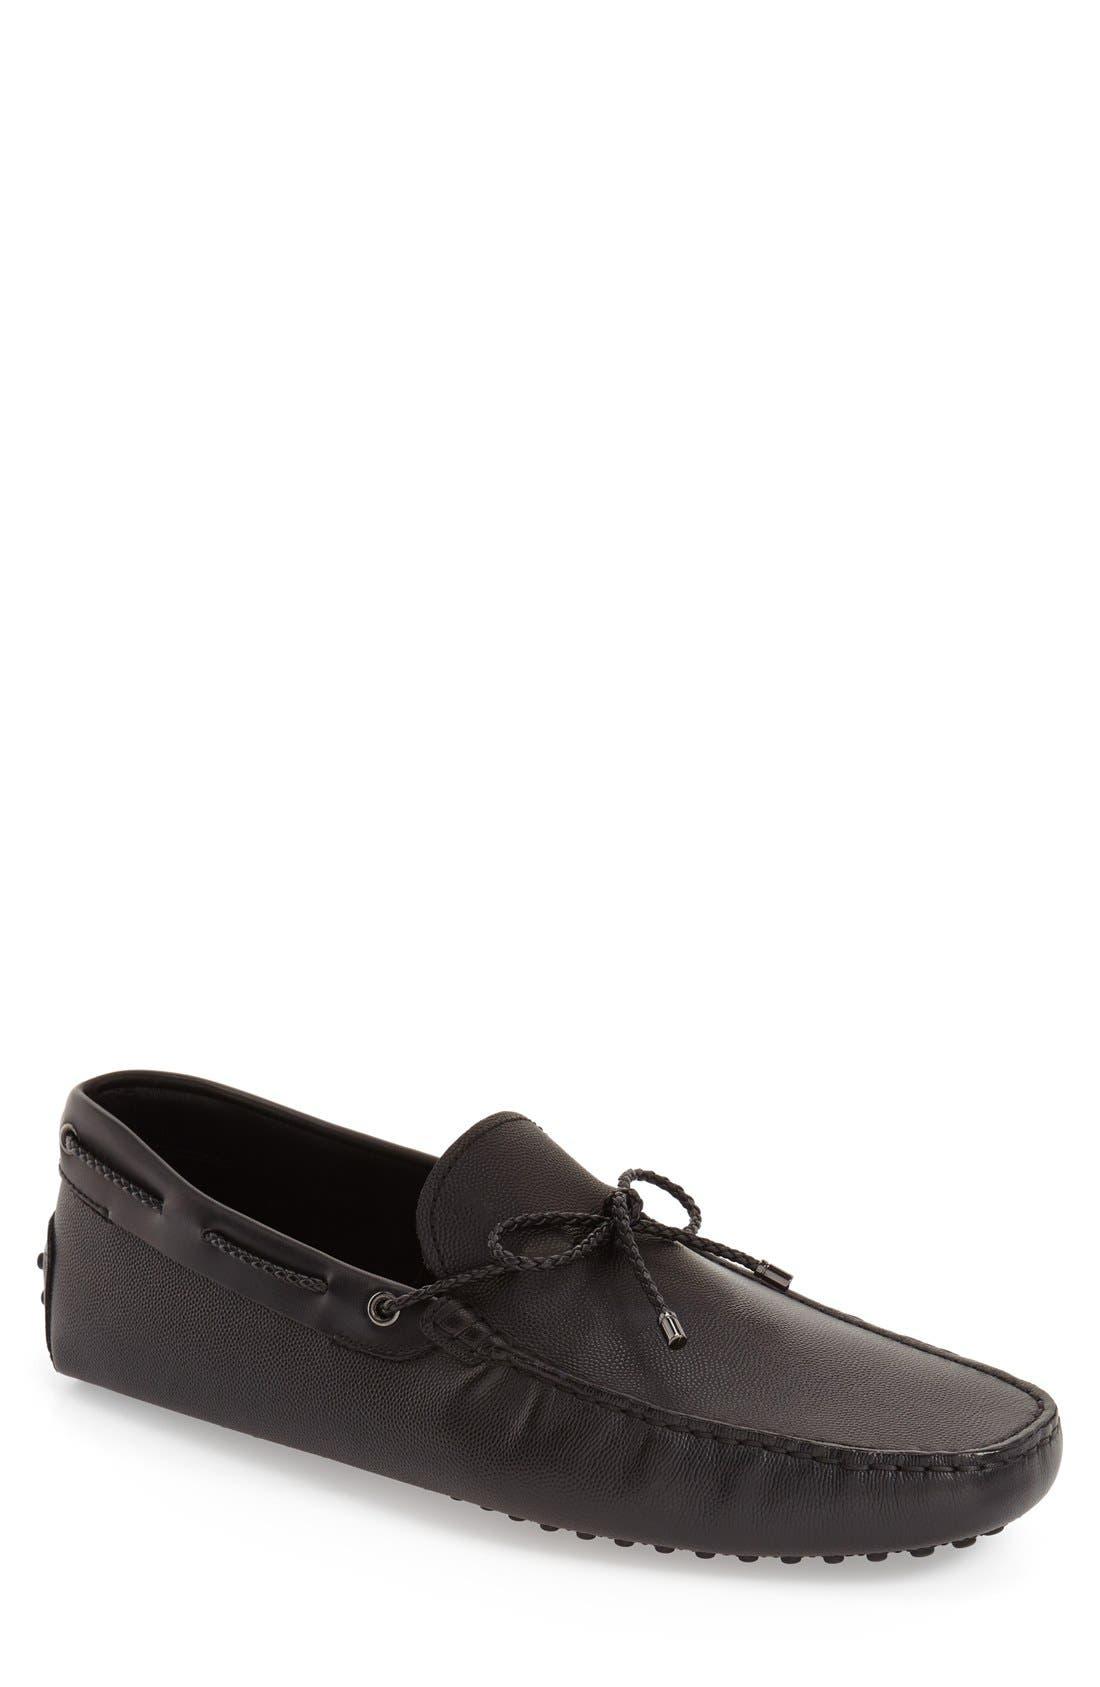 Main Image - Tods Gommini Driving Shoe (Men)